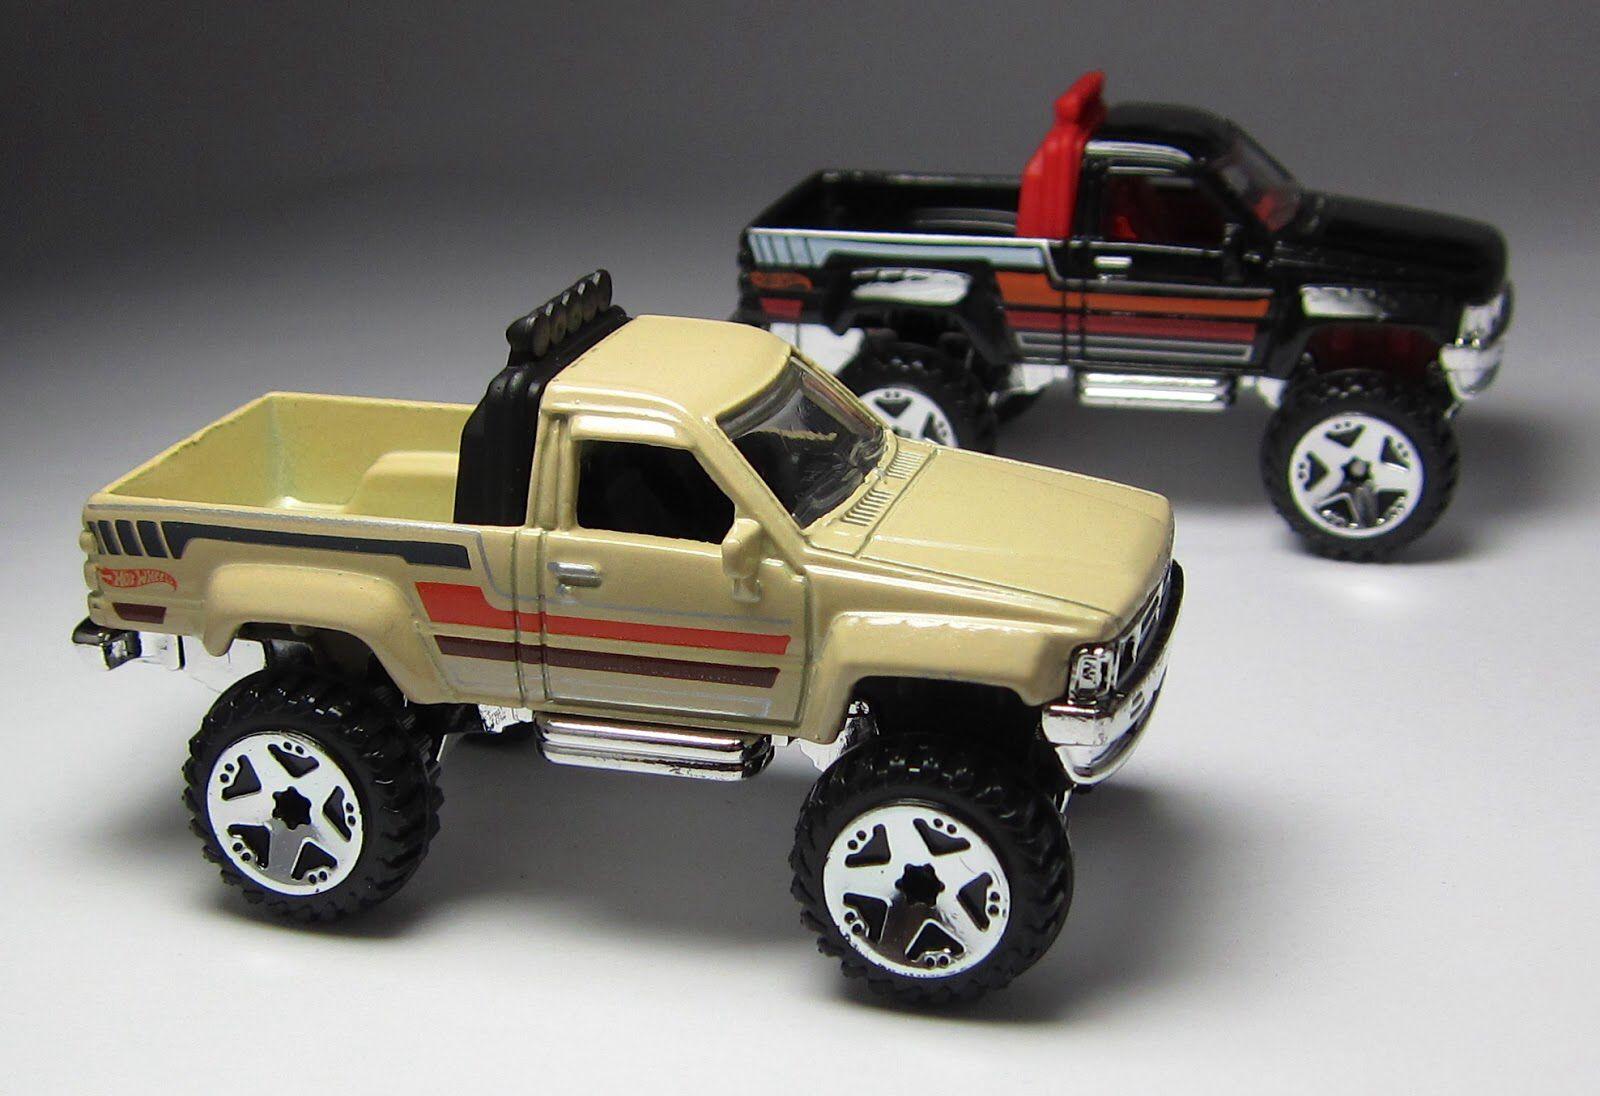 Hotwheels Toyota Trucks Toy Car Pinterest Toyota Trucks Hot